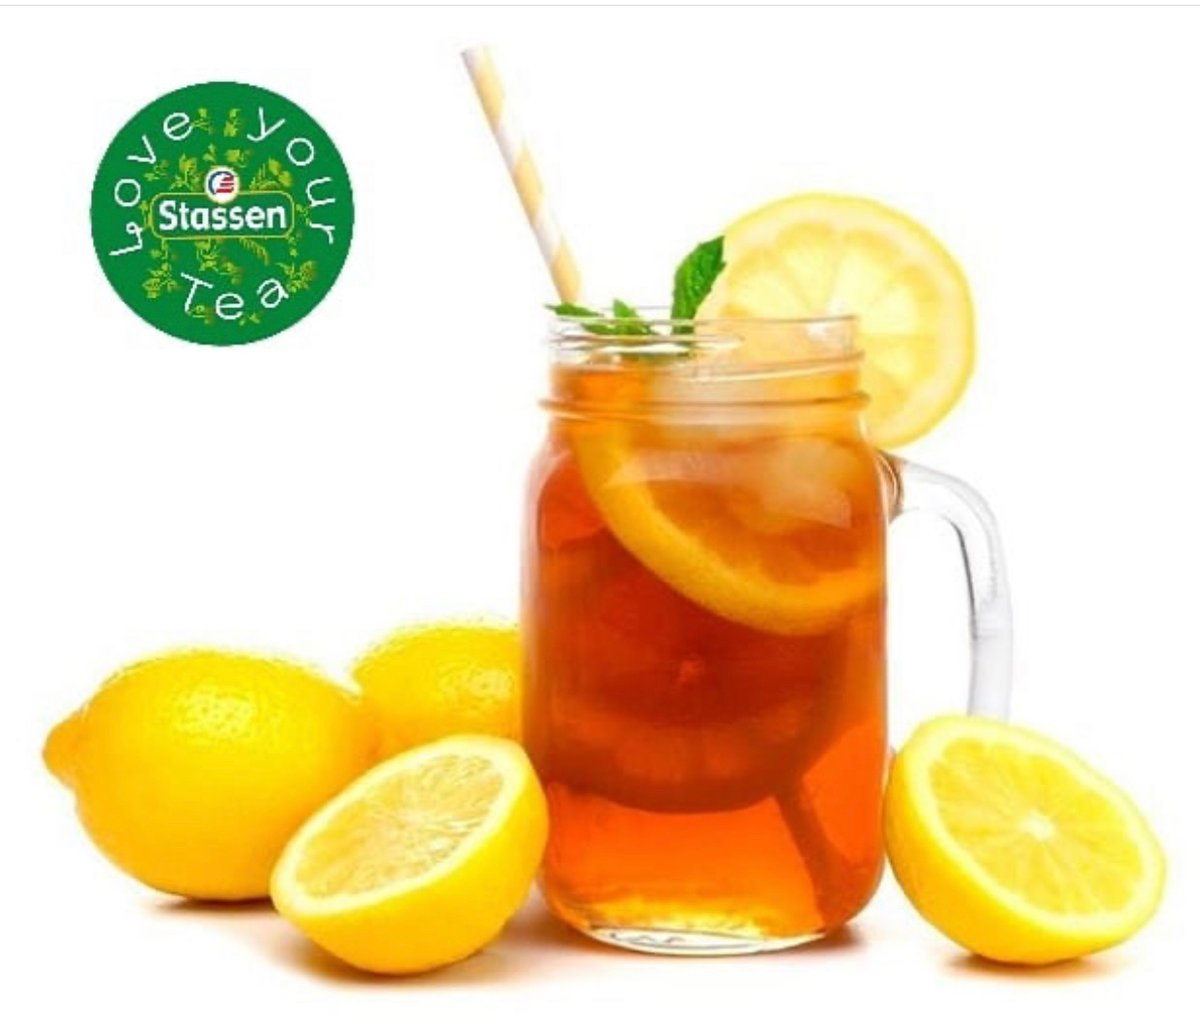 Ceylon Ice Tea 100% Ceylon Brew! Summer Ideas #ceylon #ceylontea #blacktea #tea #SriLankan #Singapore #vegan #detox #diet #drink #sglife #sgseller #lazada #Qoo10メガ割 #qoo10sg #shopee #healthylifestyle #icetea #summer #stassensg #sg #lemontea #life  #selfcare #tealover #sgfoodie